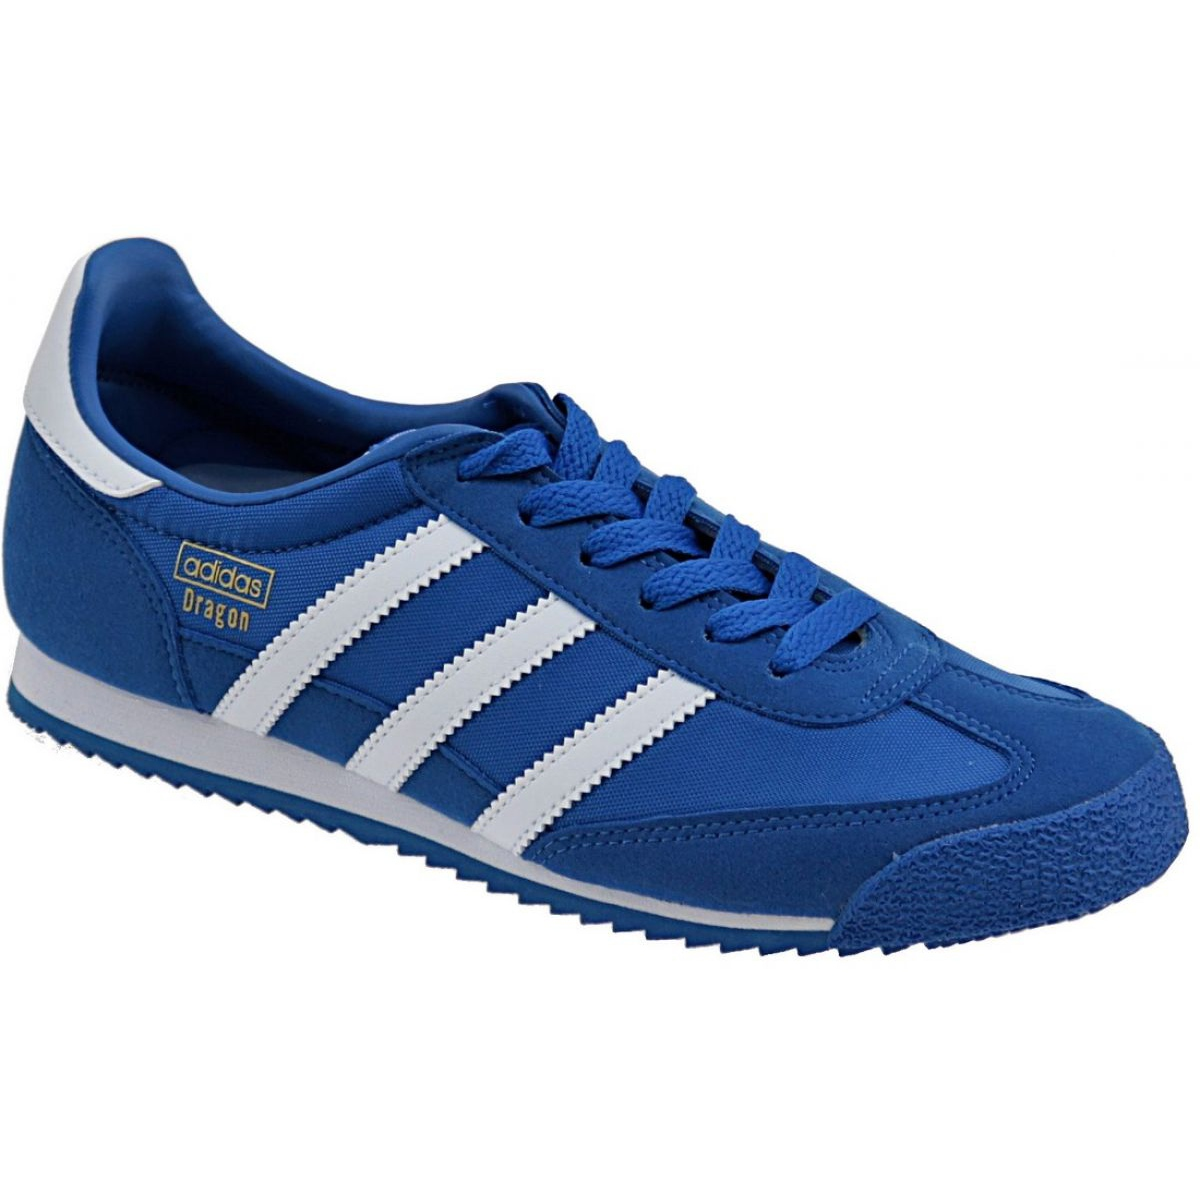 Blau Adidas Dragon Og Jr BB2486 Schuhe